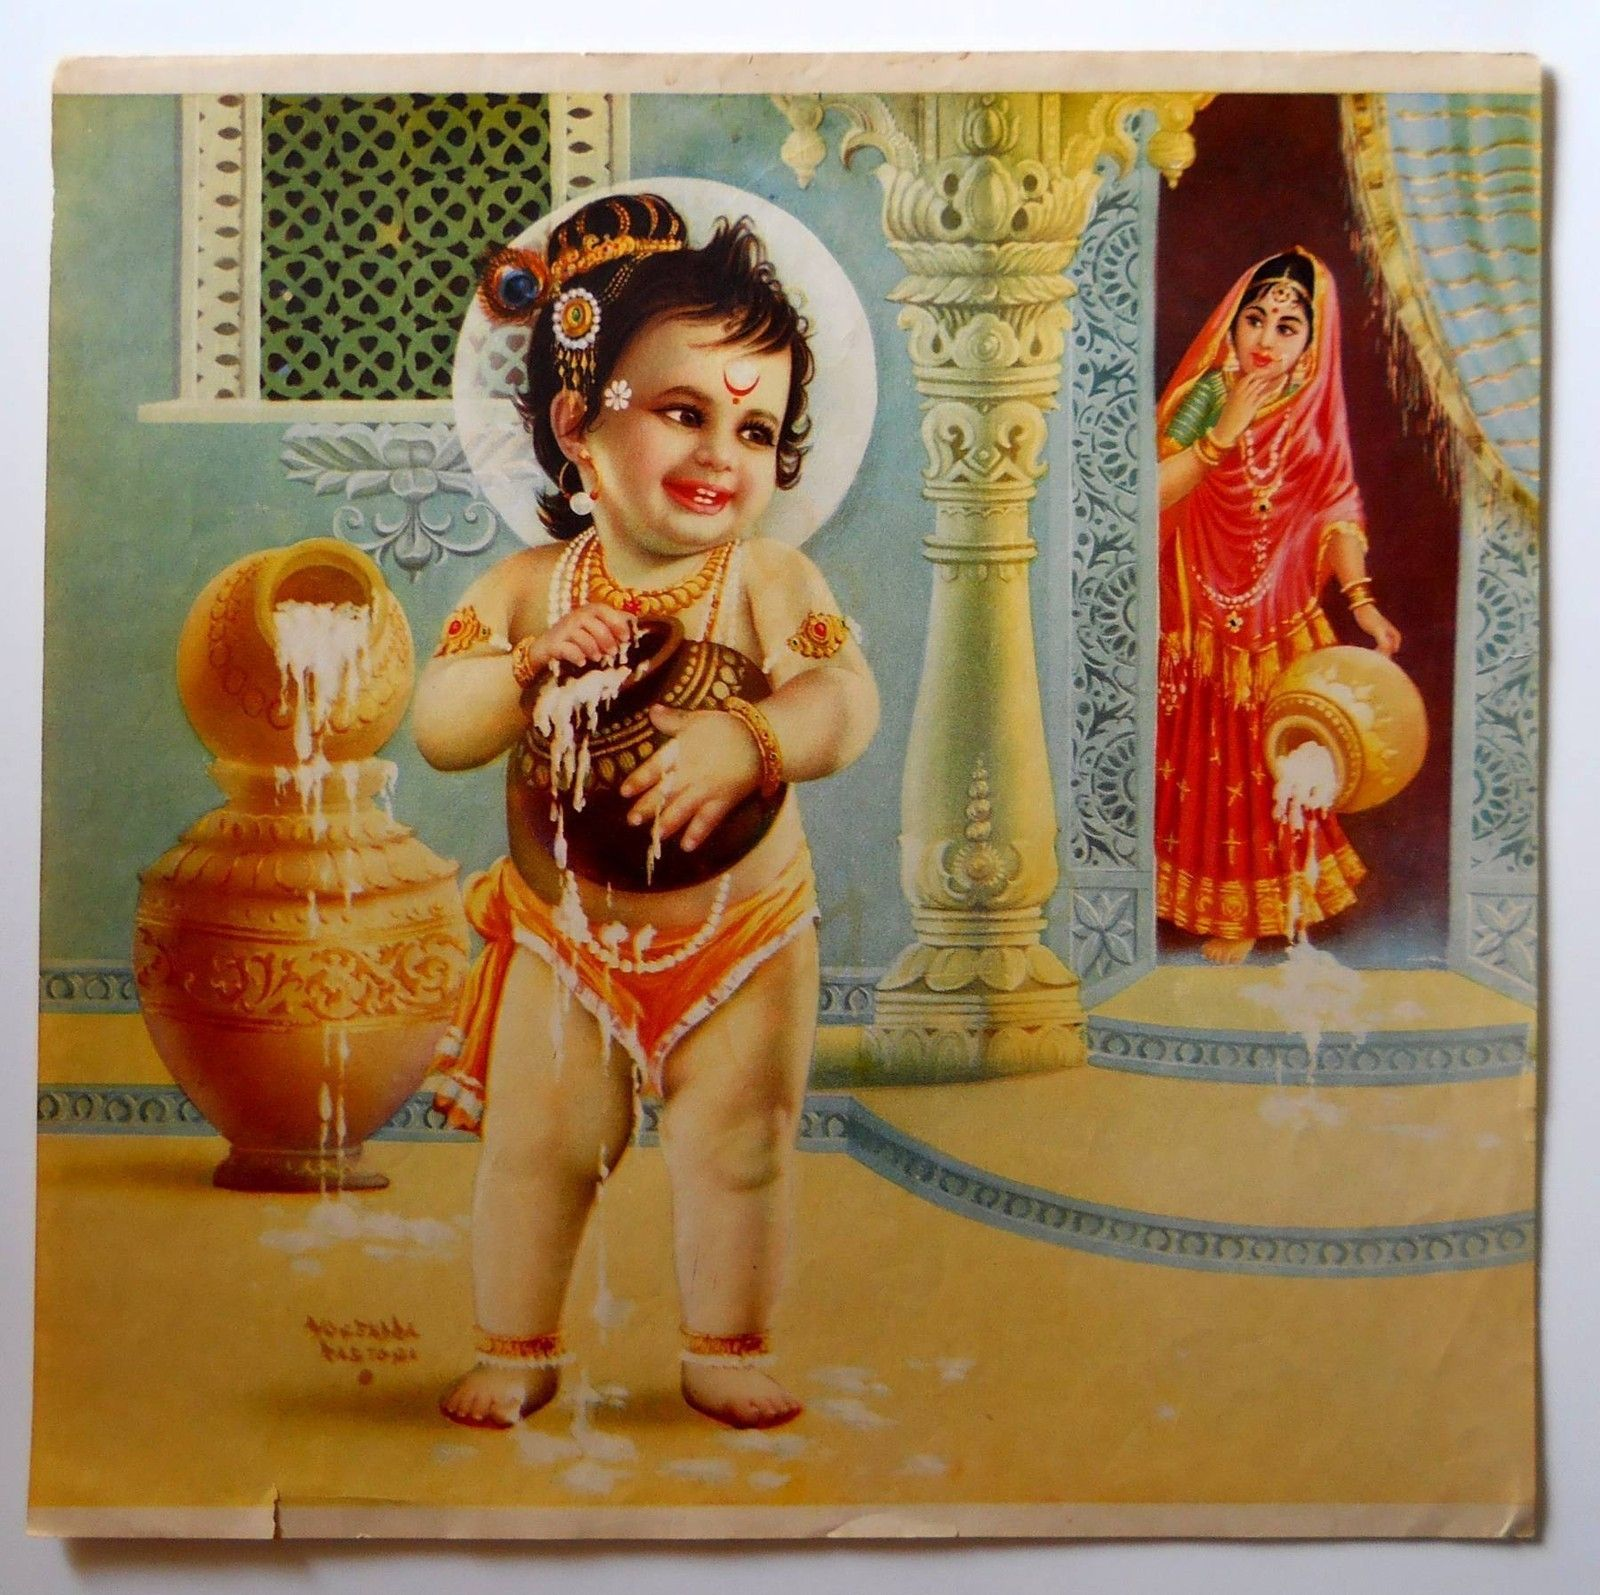 Calendar Art Of Hindu Gods : India vintage calendar print hindu god bal krishna gngp